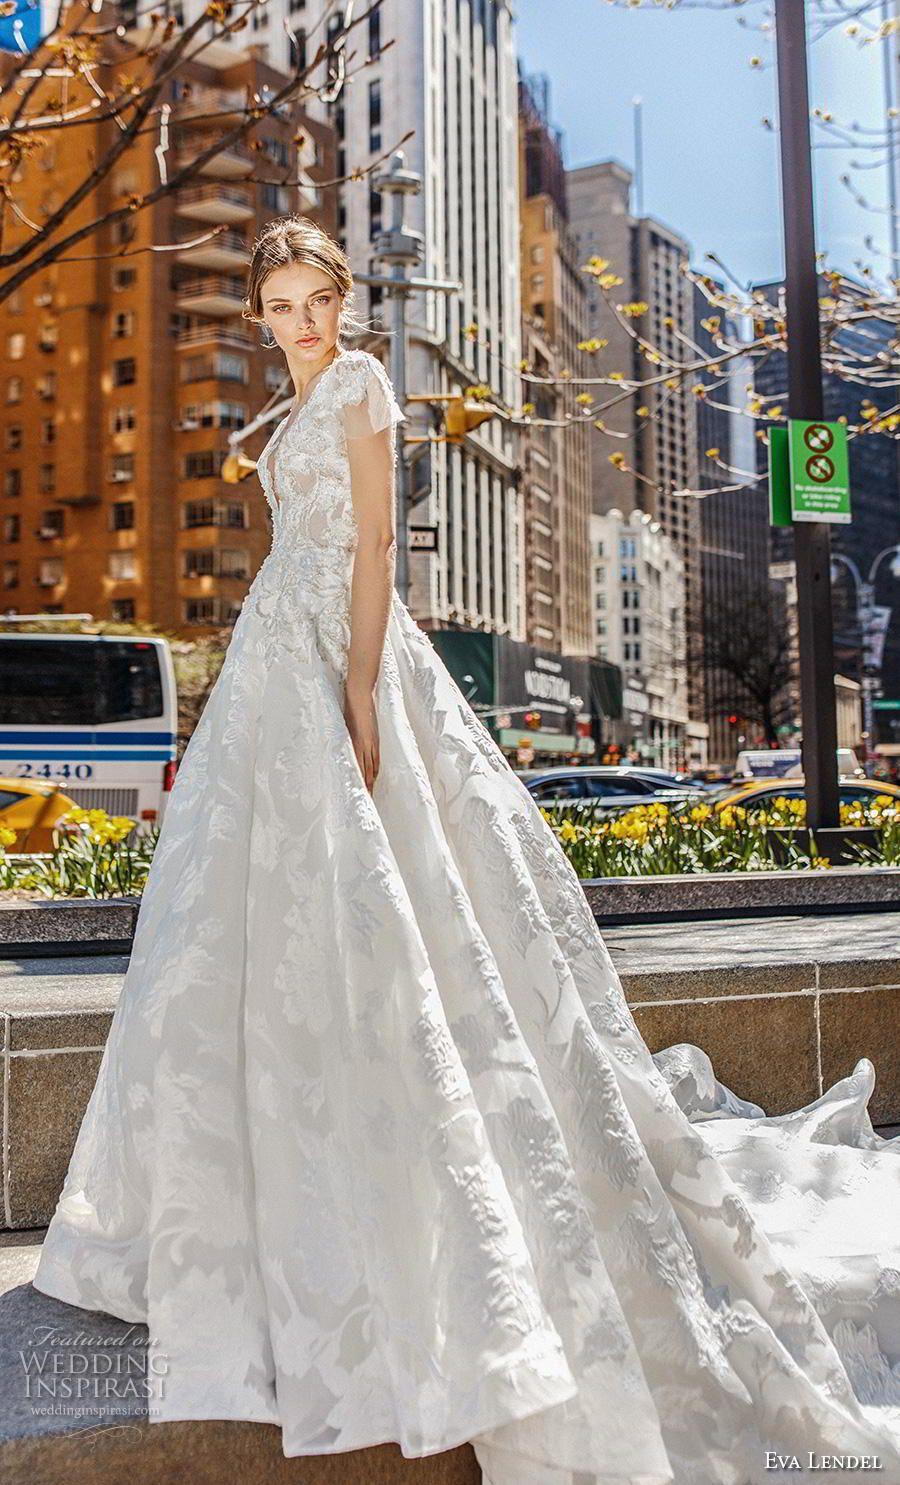 Eva Lendel  Wedding Dresses u ucSunriseud Bridal Collection in